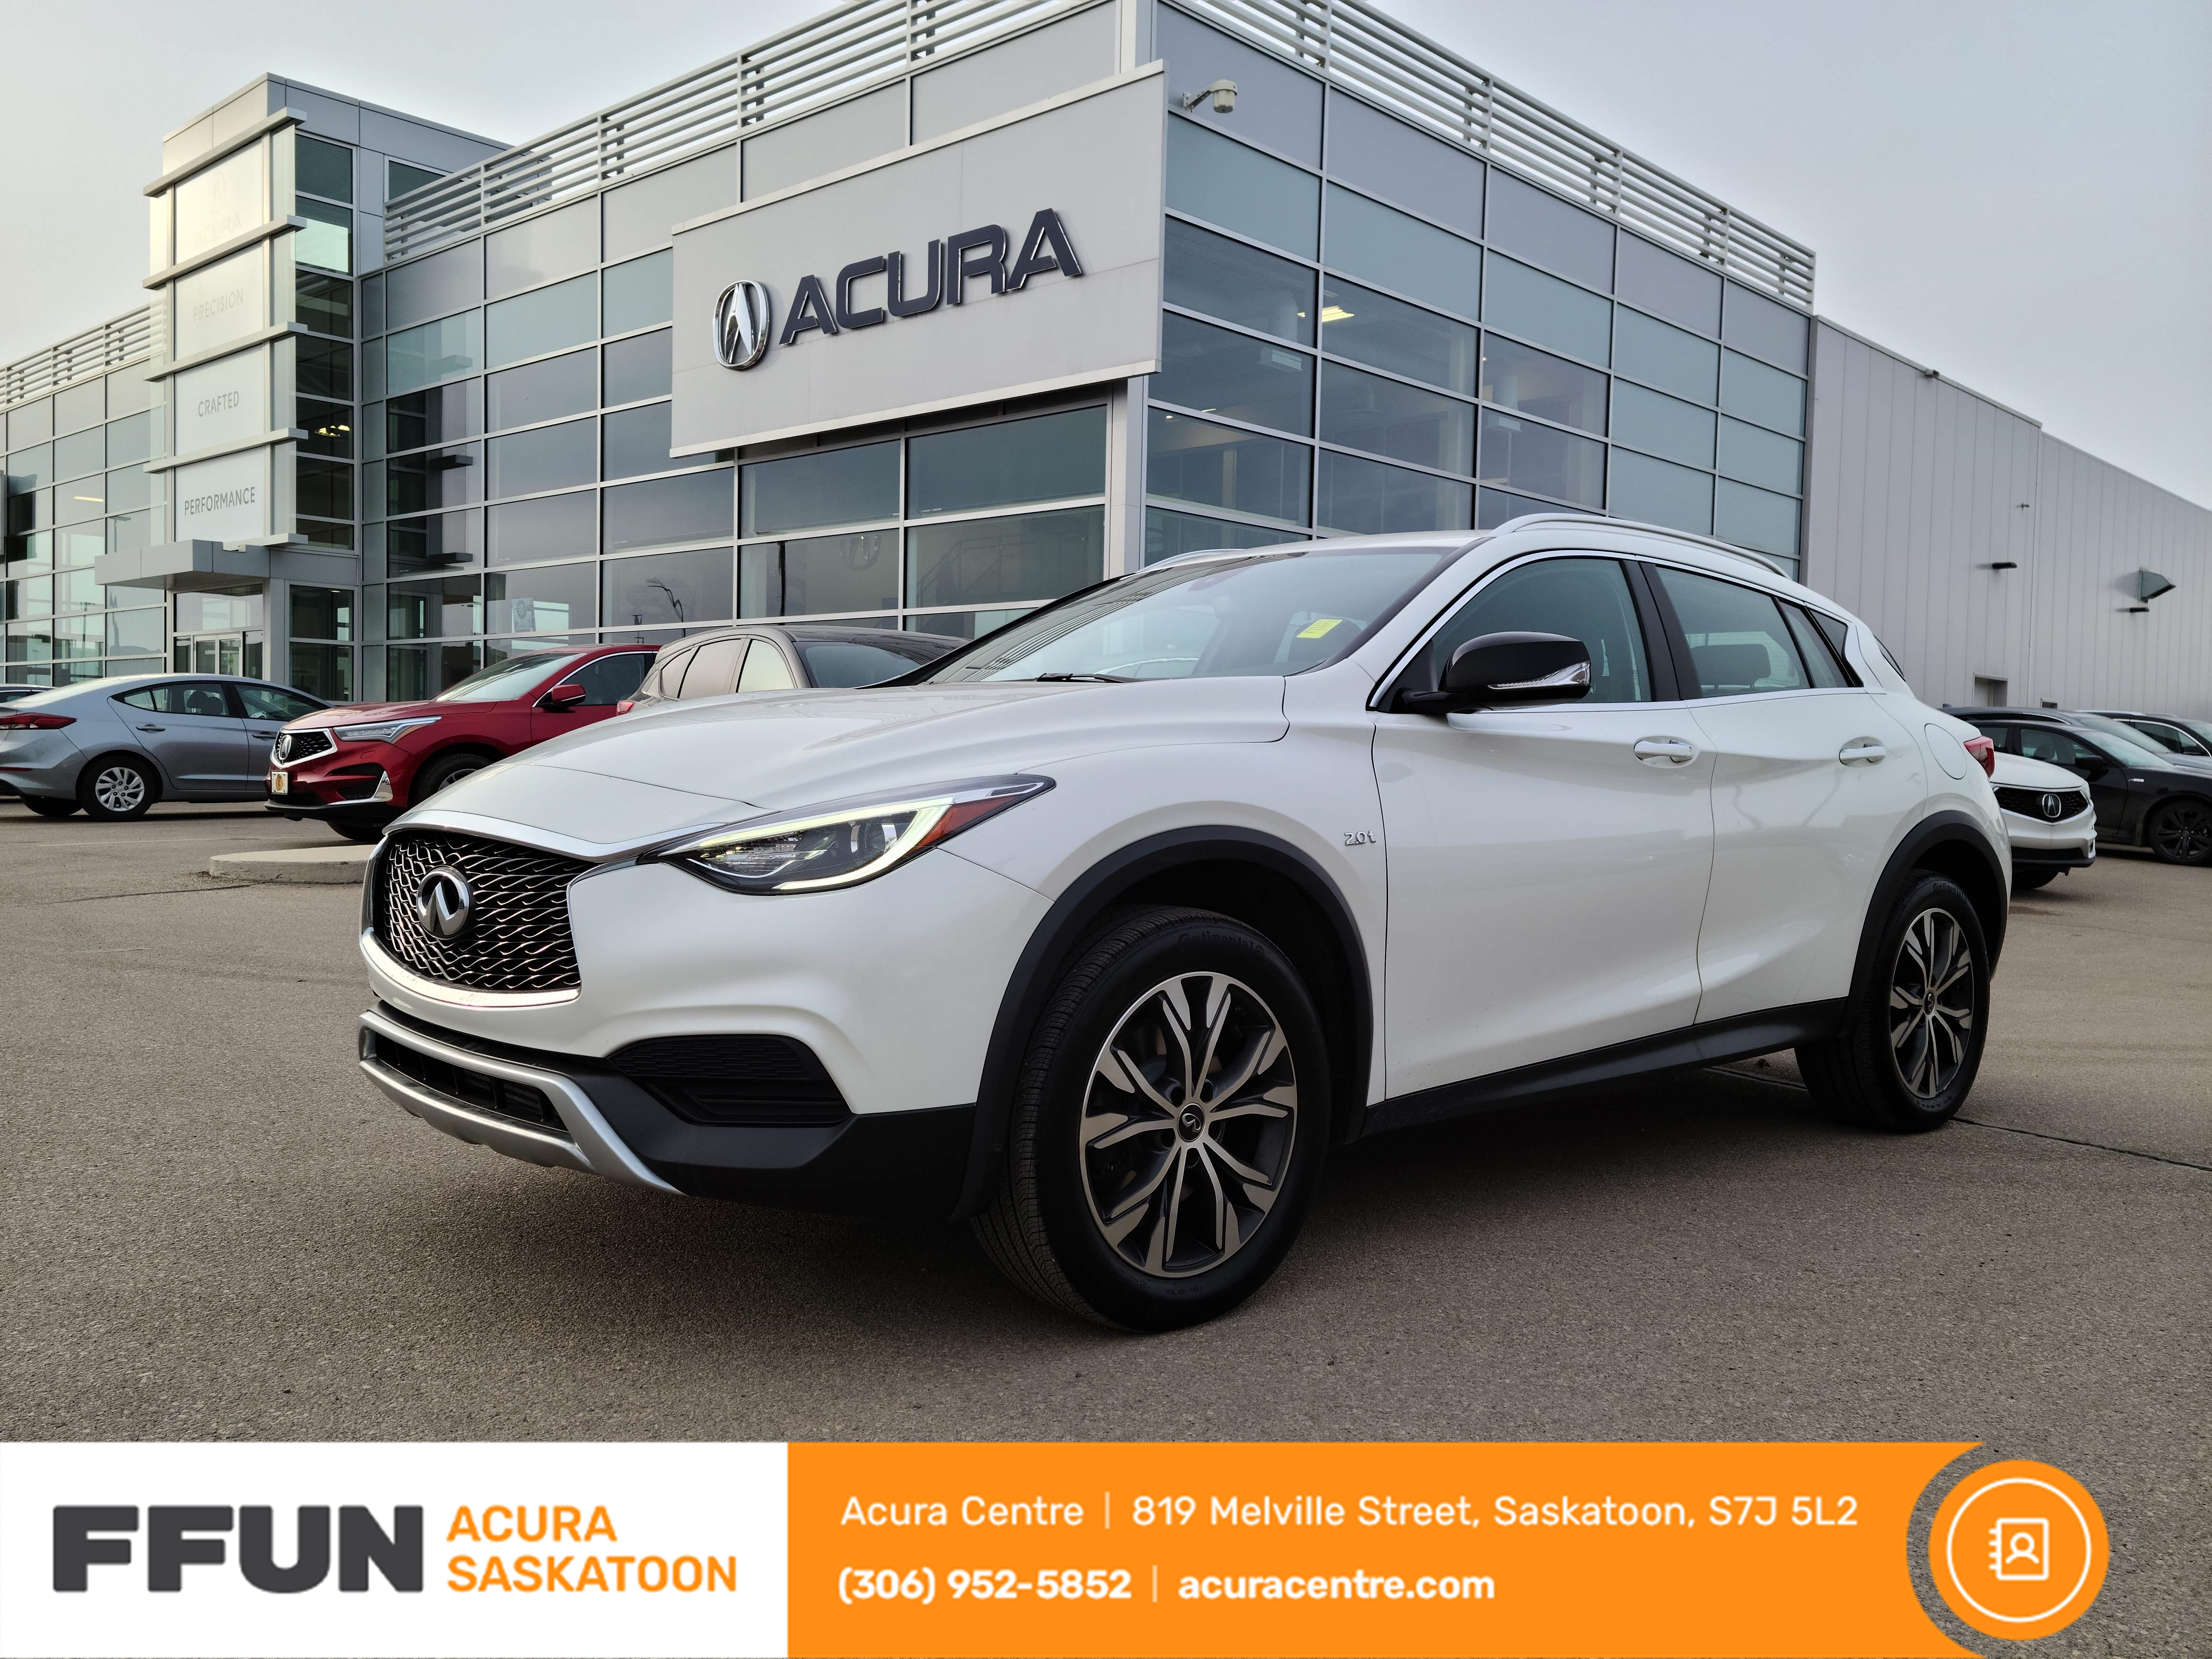 used 2017 INFINITI QX30 car, priced at $25,988